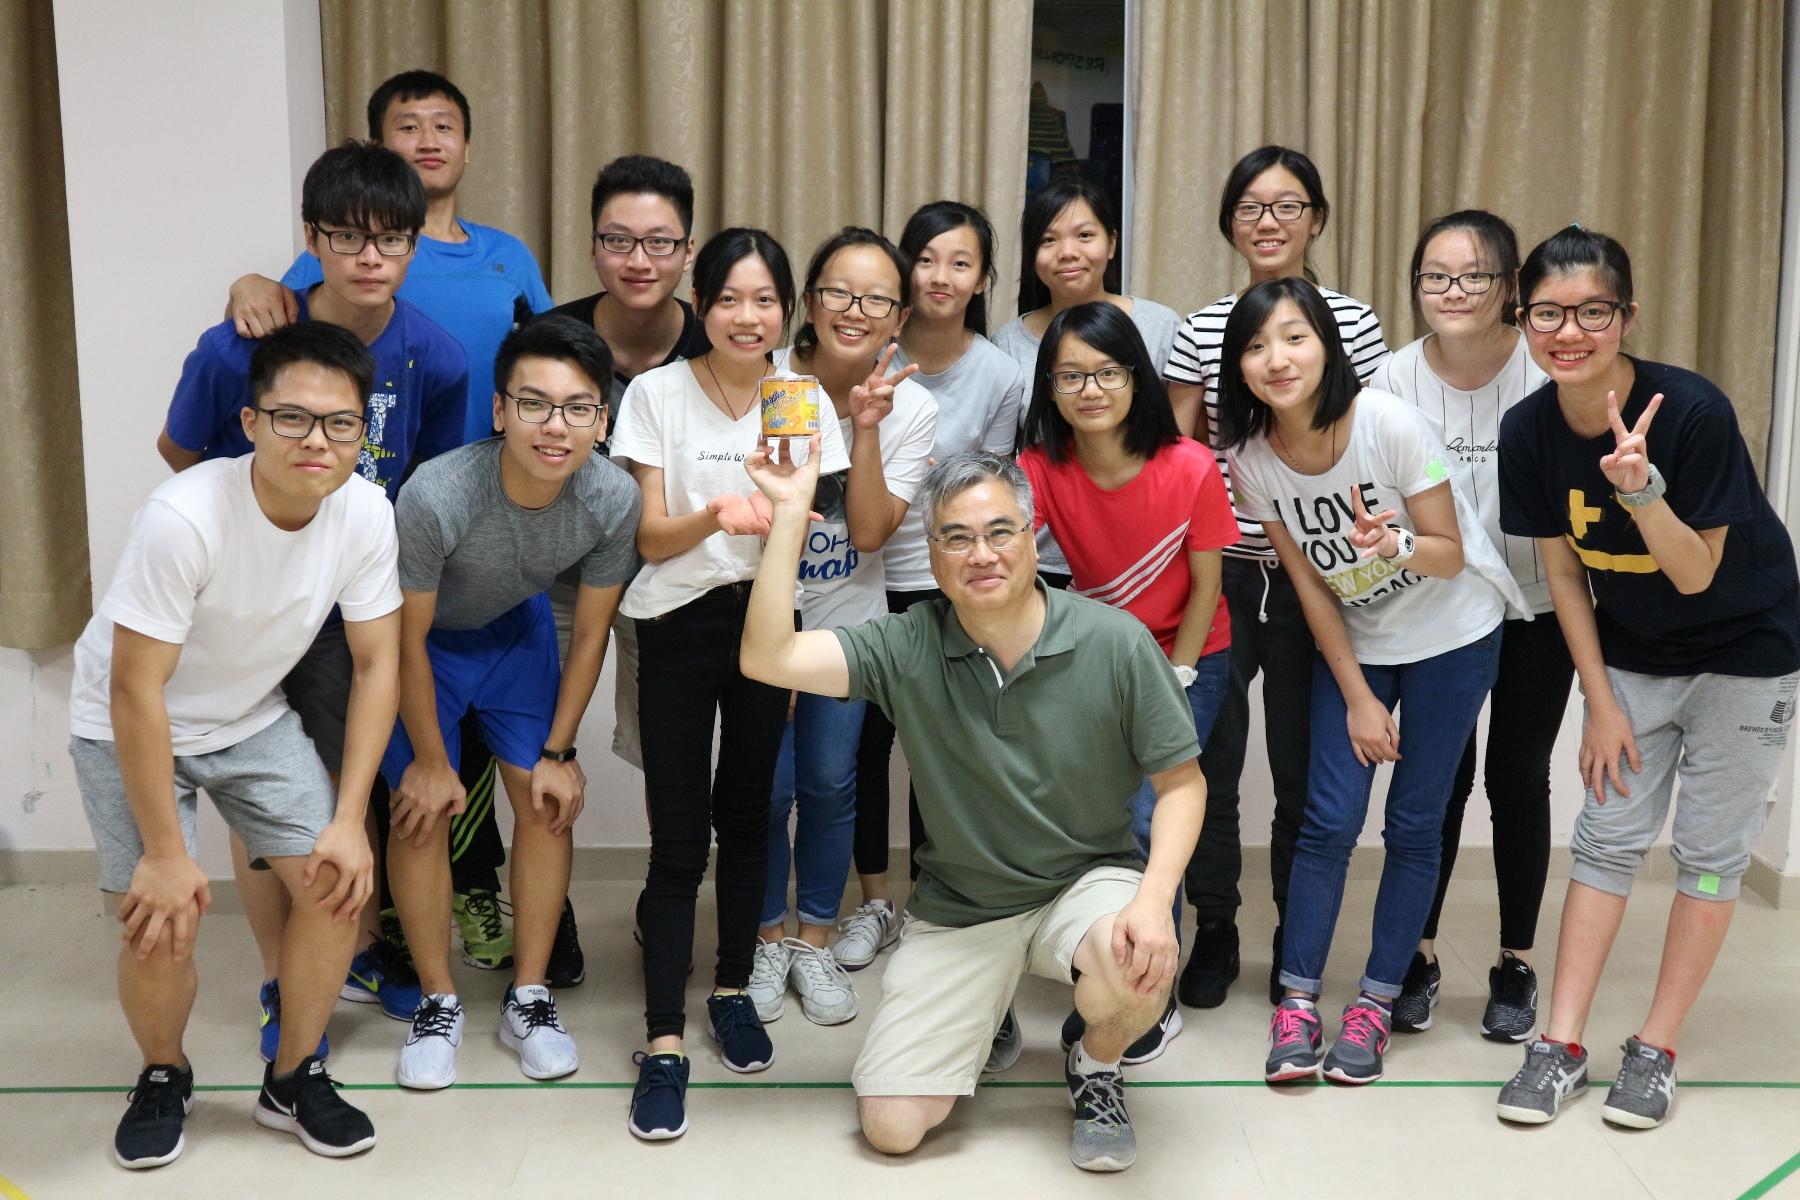 http://www.npc.edu.hk/sites/default/files/img_3300.jpg